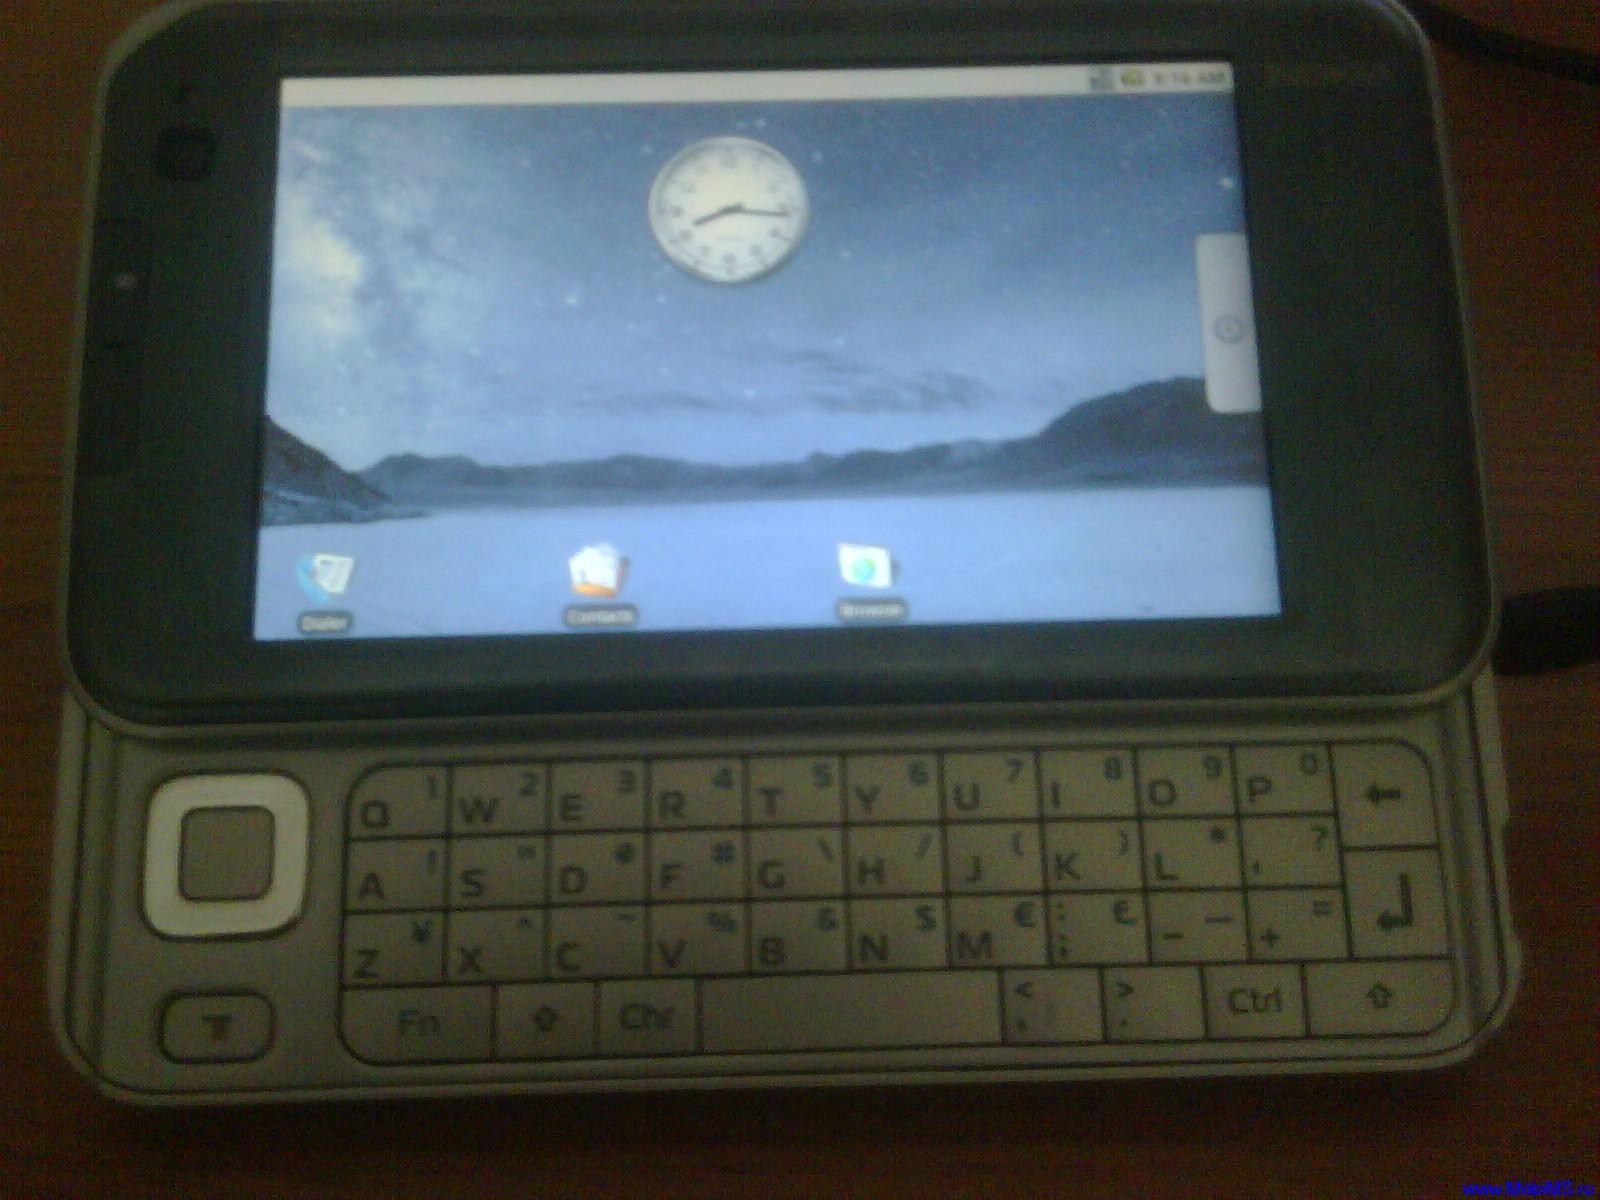 Установка Android (NitDroid) на Nokia N900